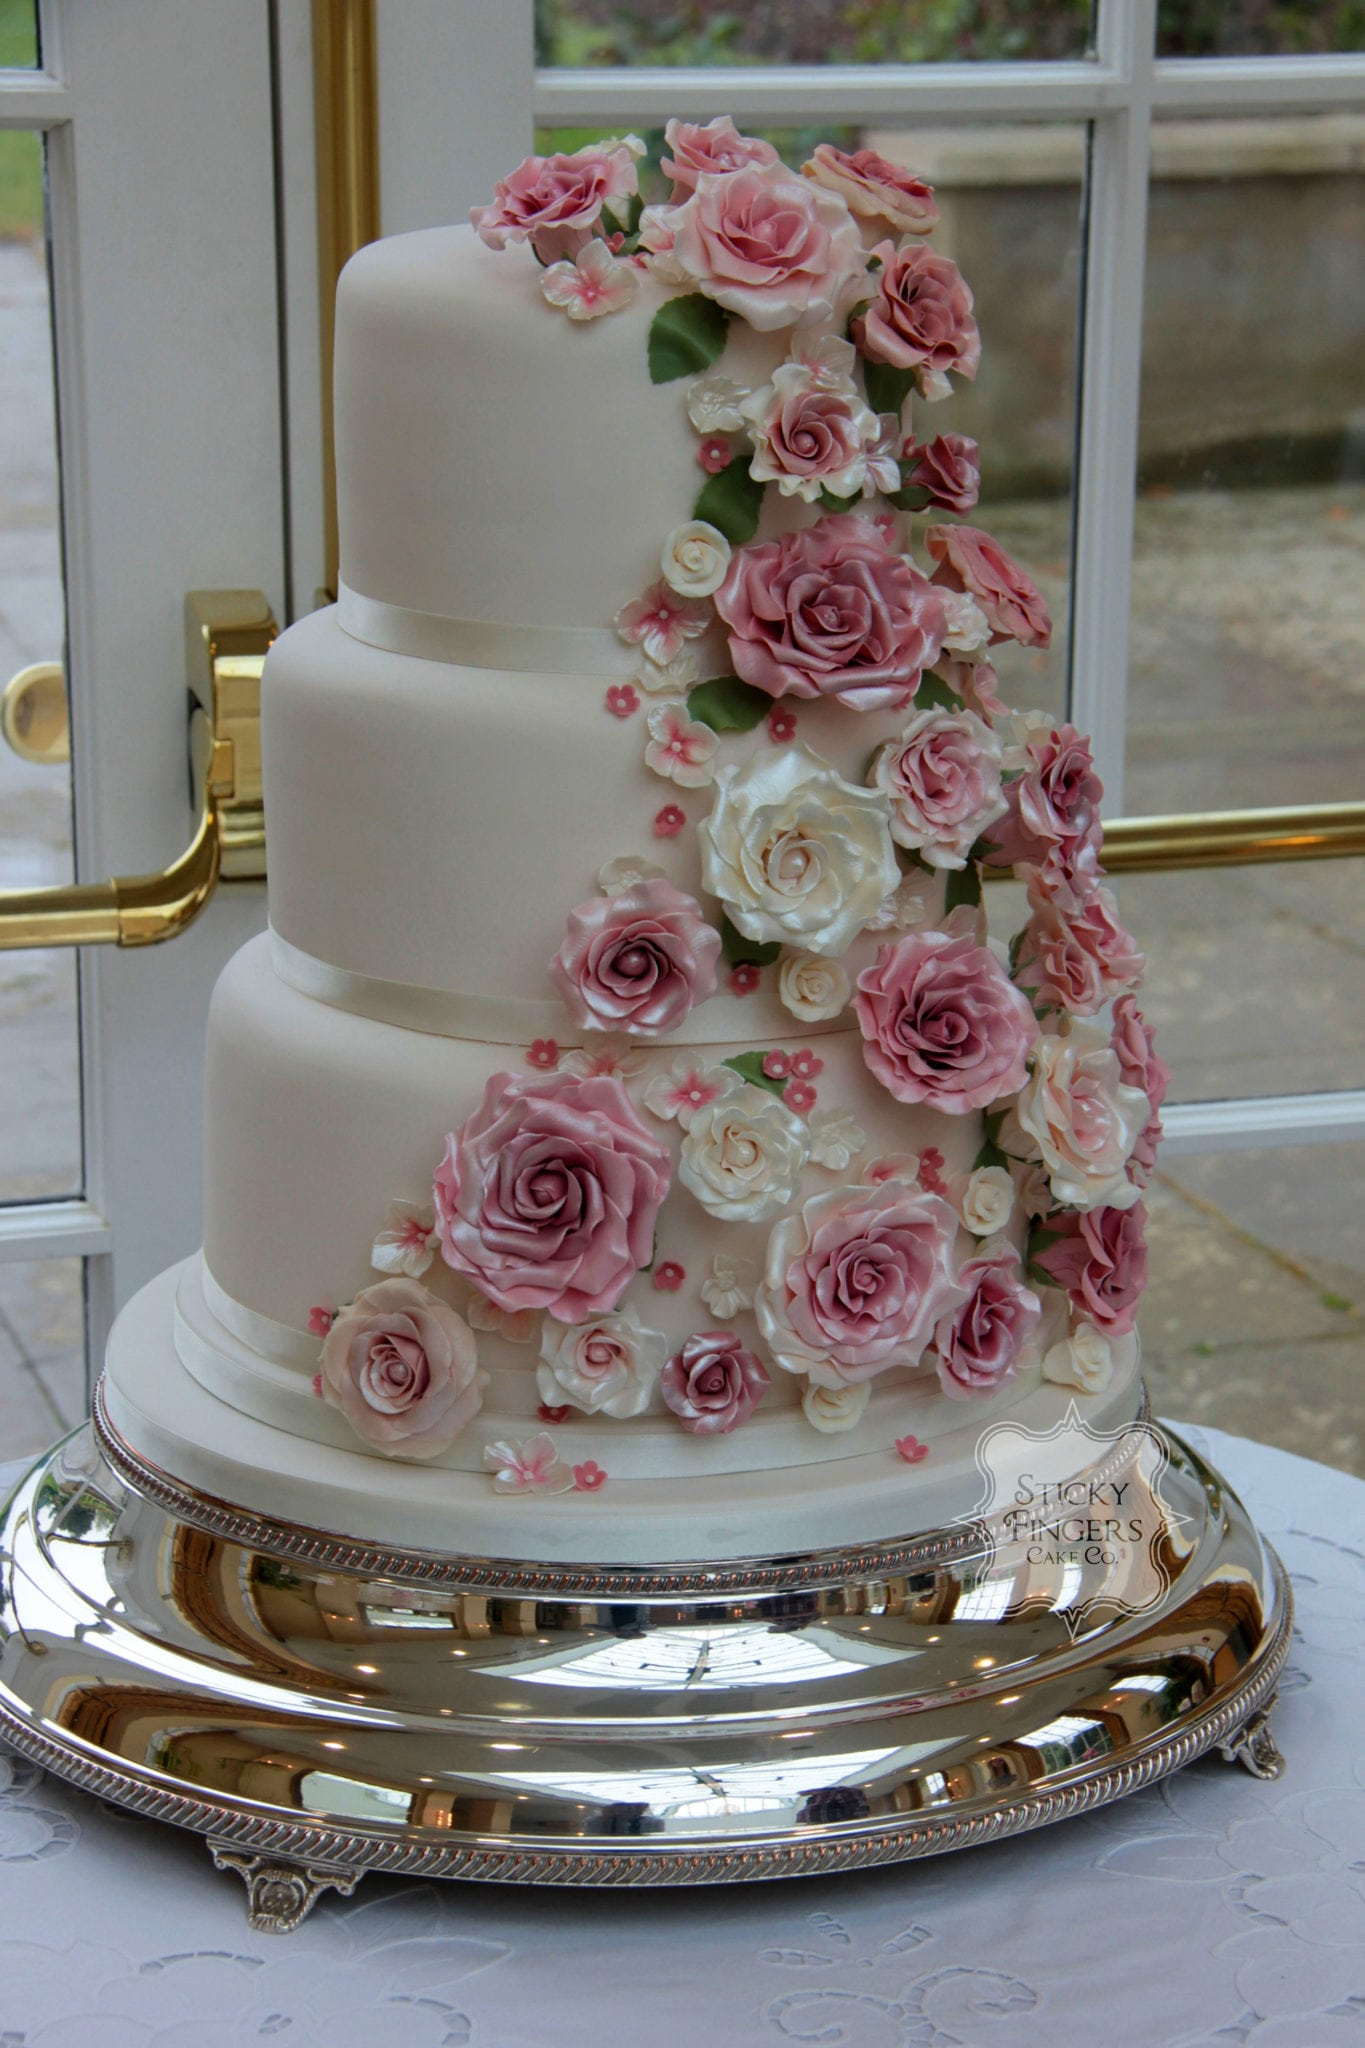 The Bespoke Wedding Cake…